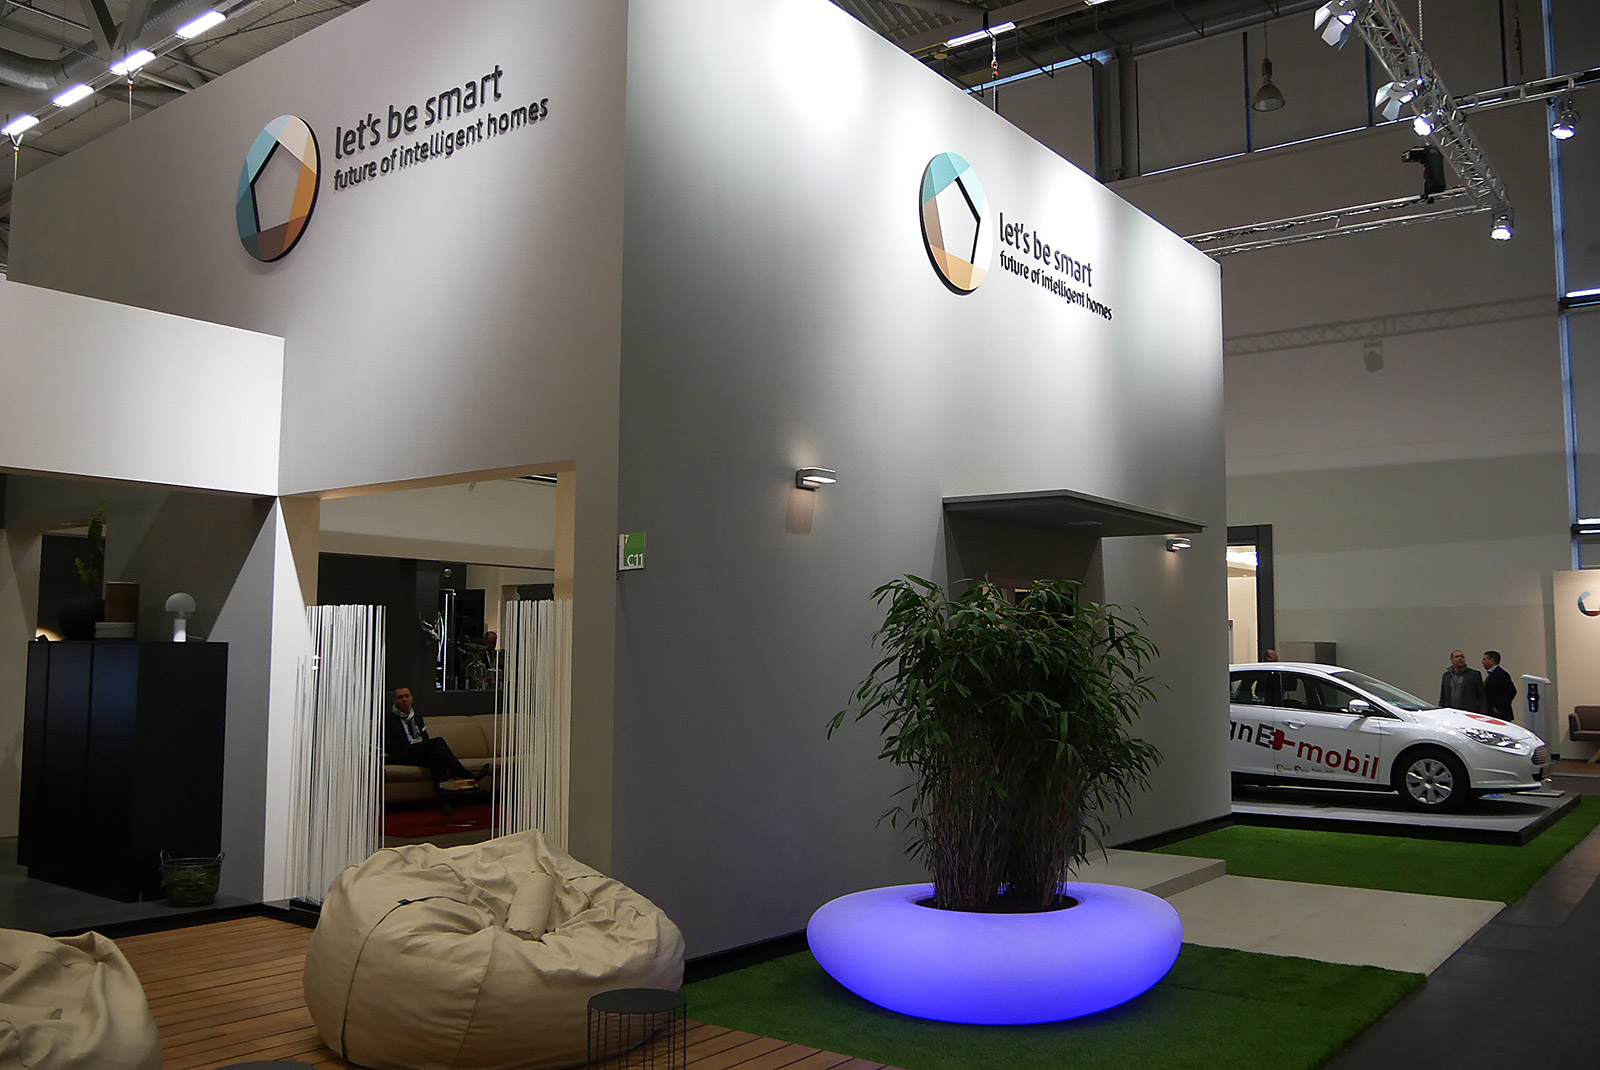 livingkitchen hier kommt die zukunft in die k che. Black Bedroom Furniture Sets. Home Design Ideas